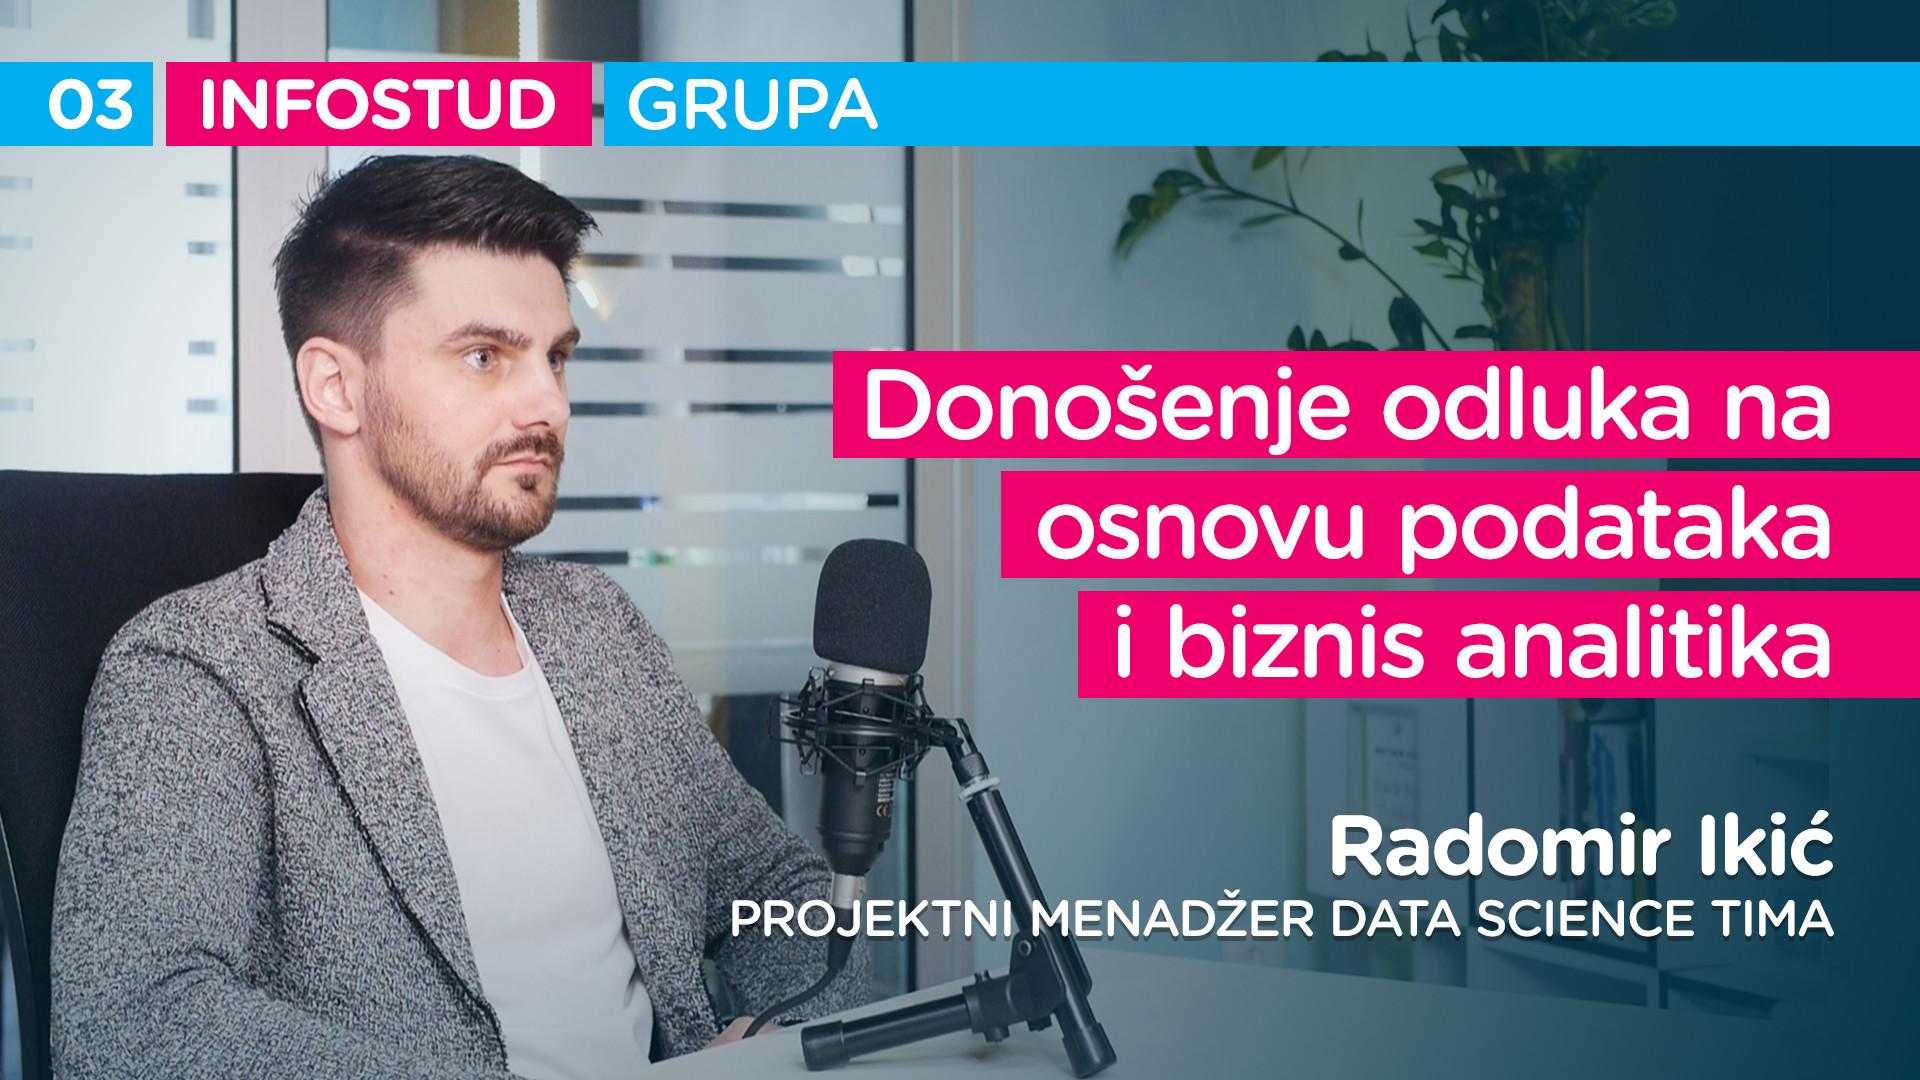 Infostud grupa specijal EP003: Radomir Ikić